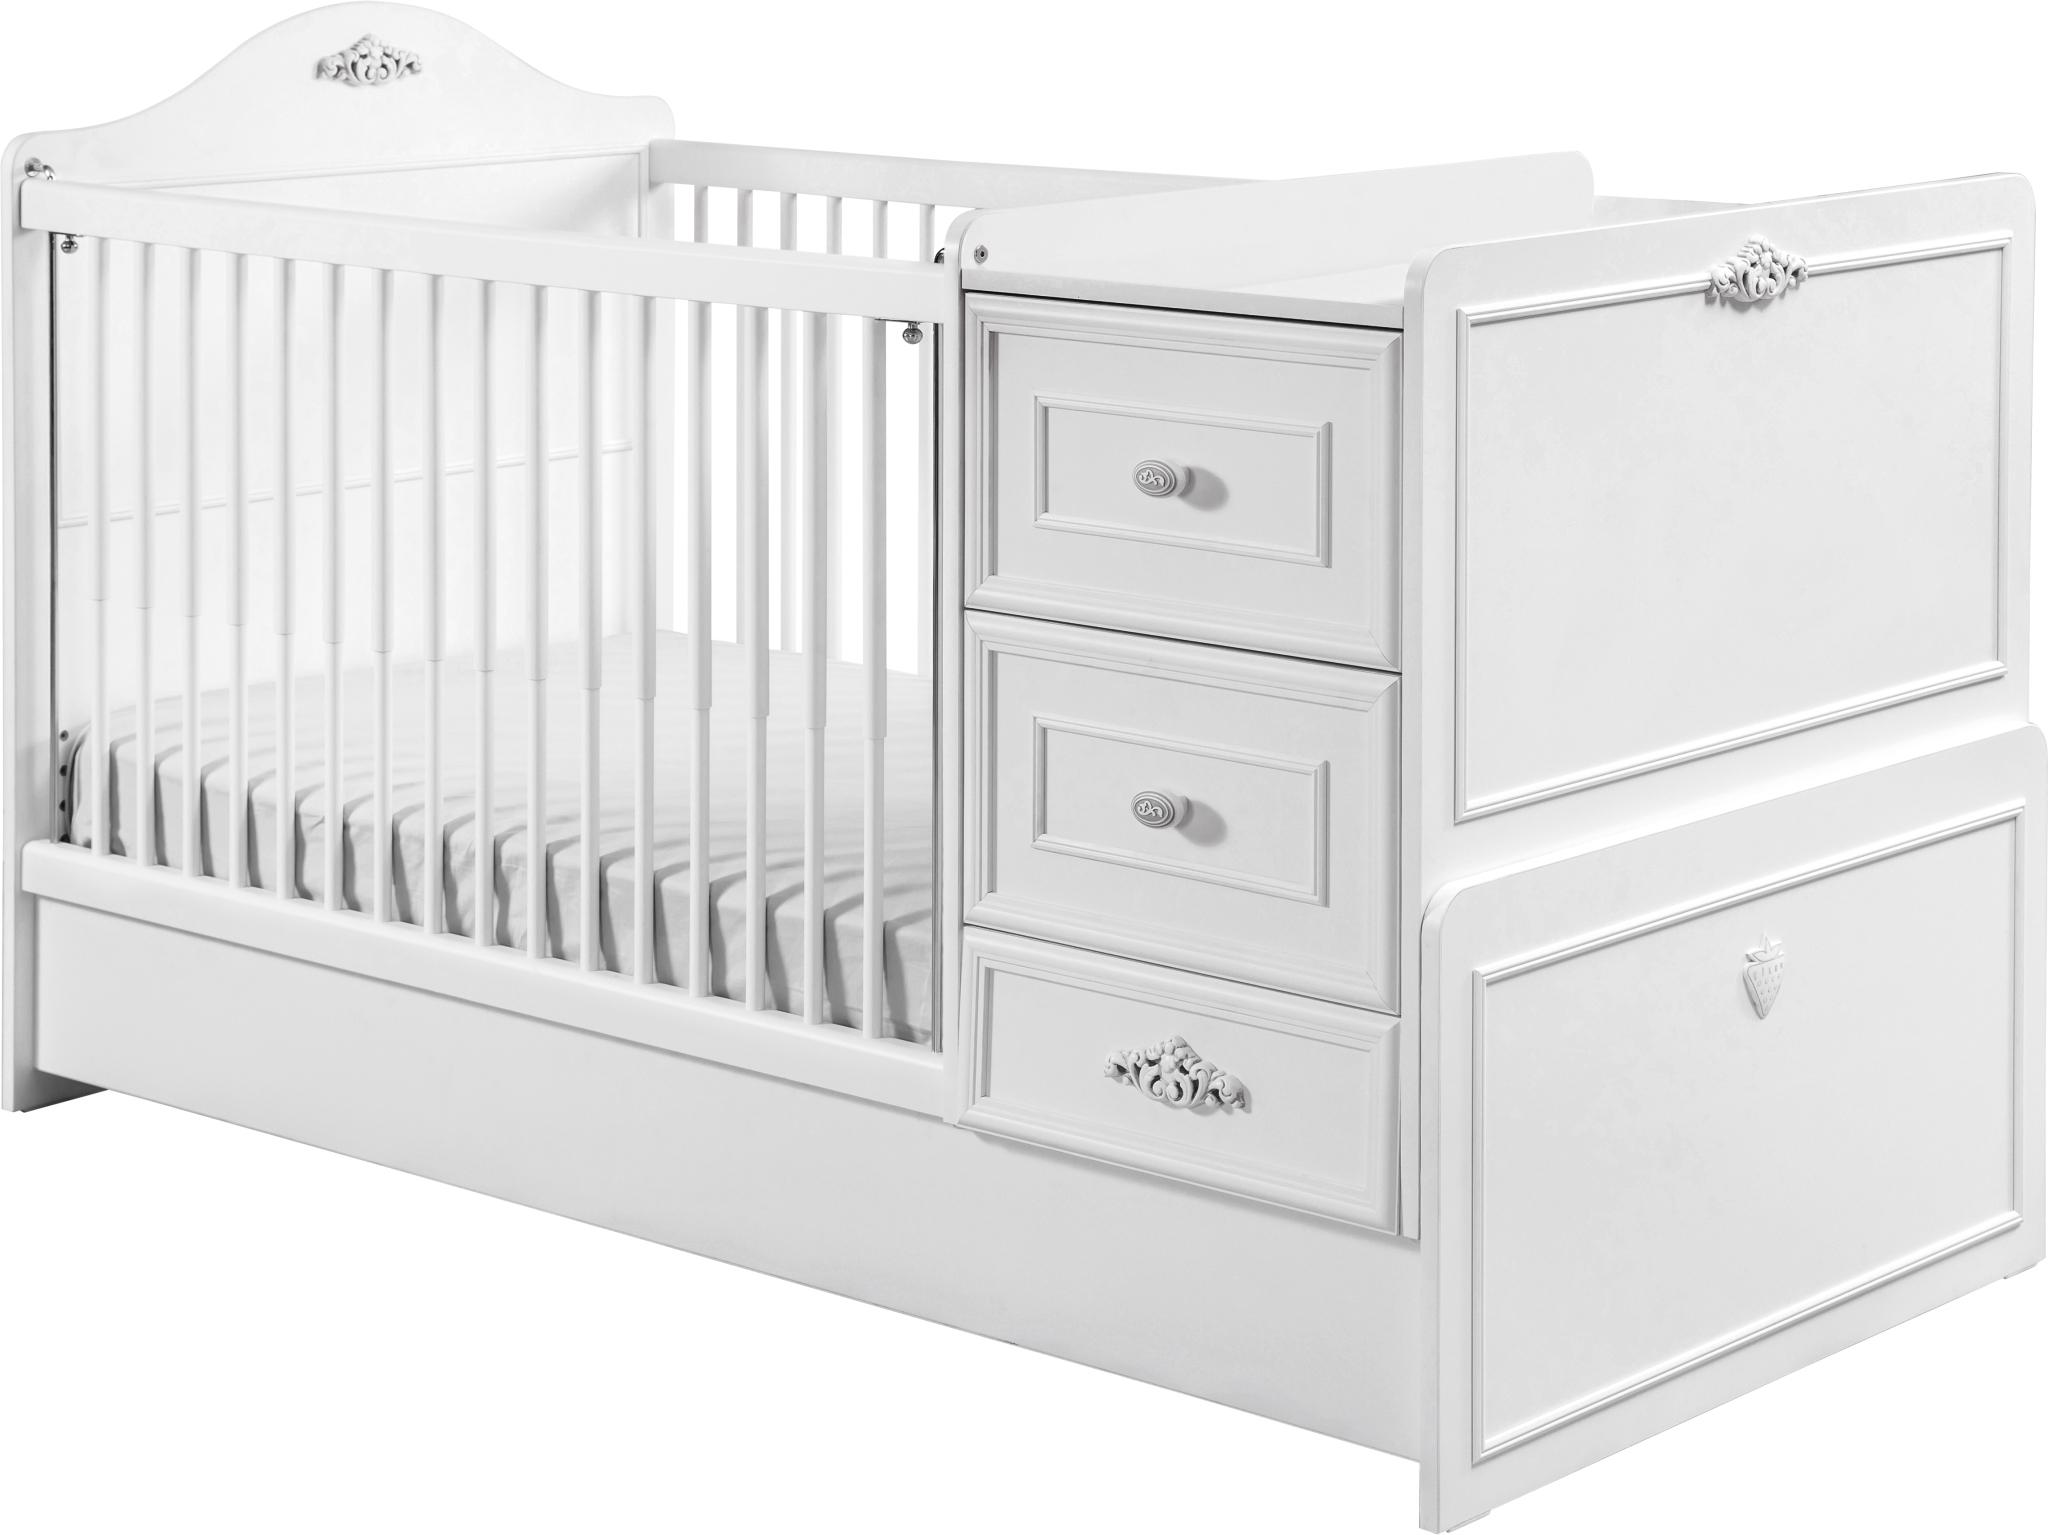 Patut transformabil din pal, pentru bebe Romantic Baby White, 160 x 75 cm poza